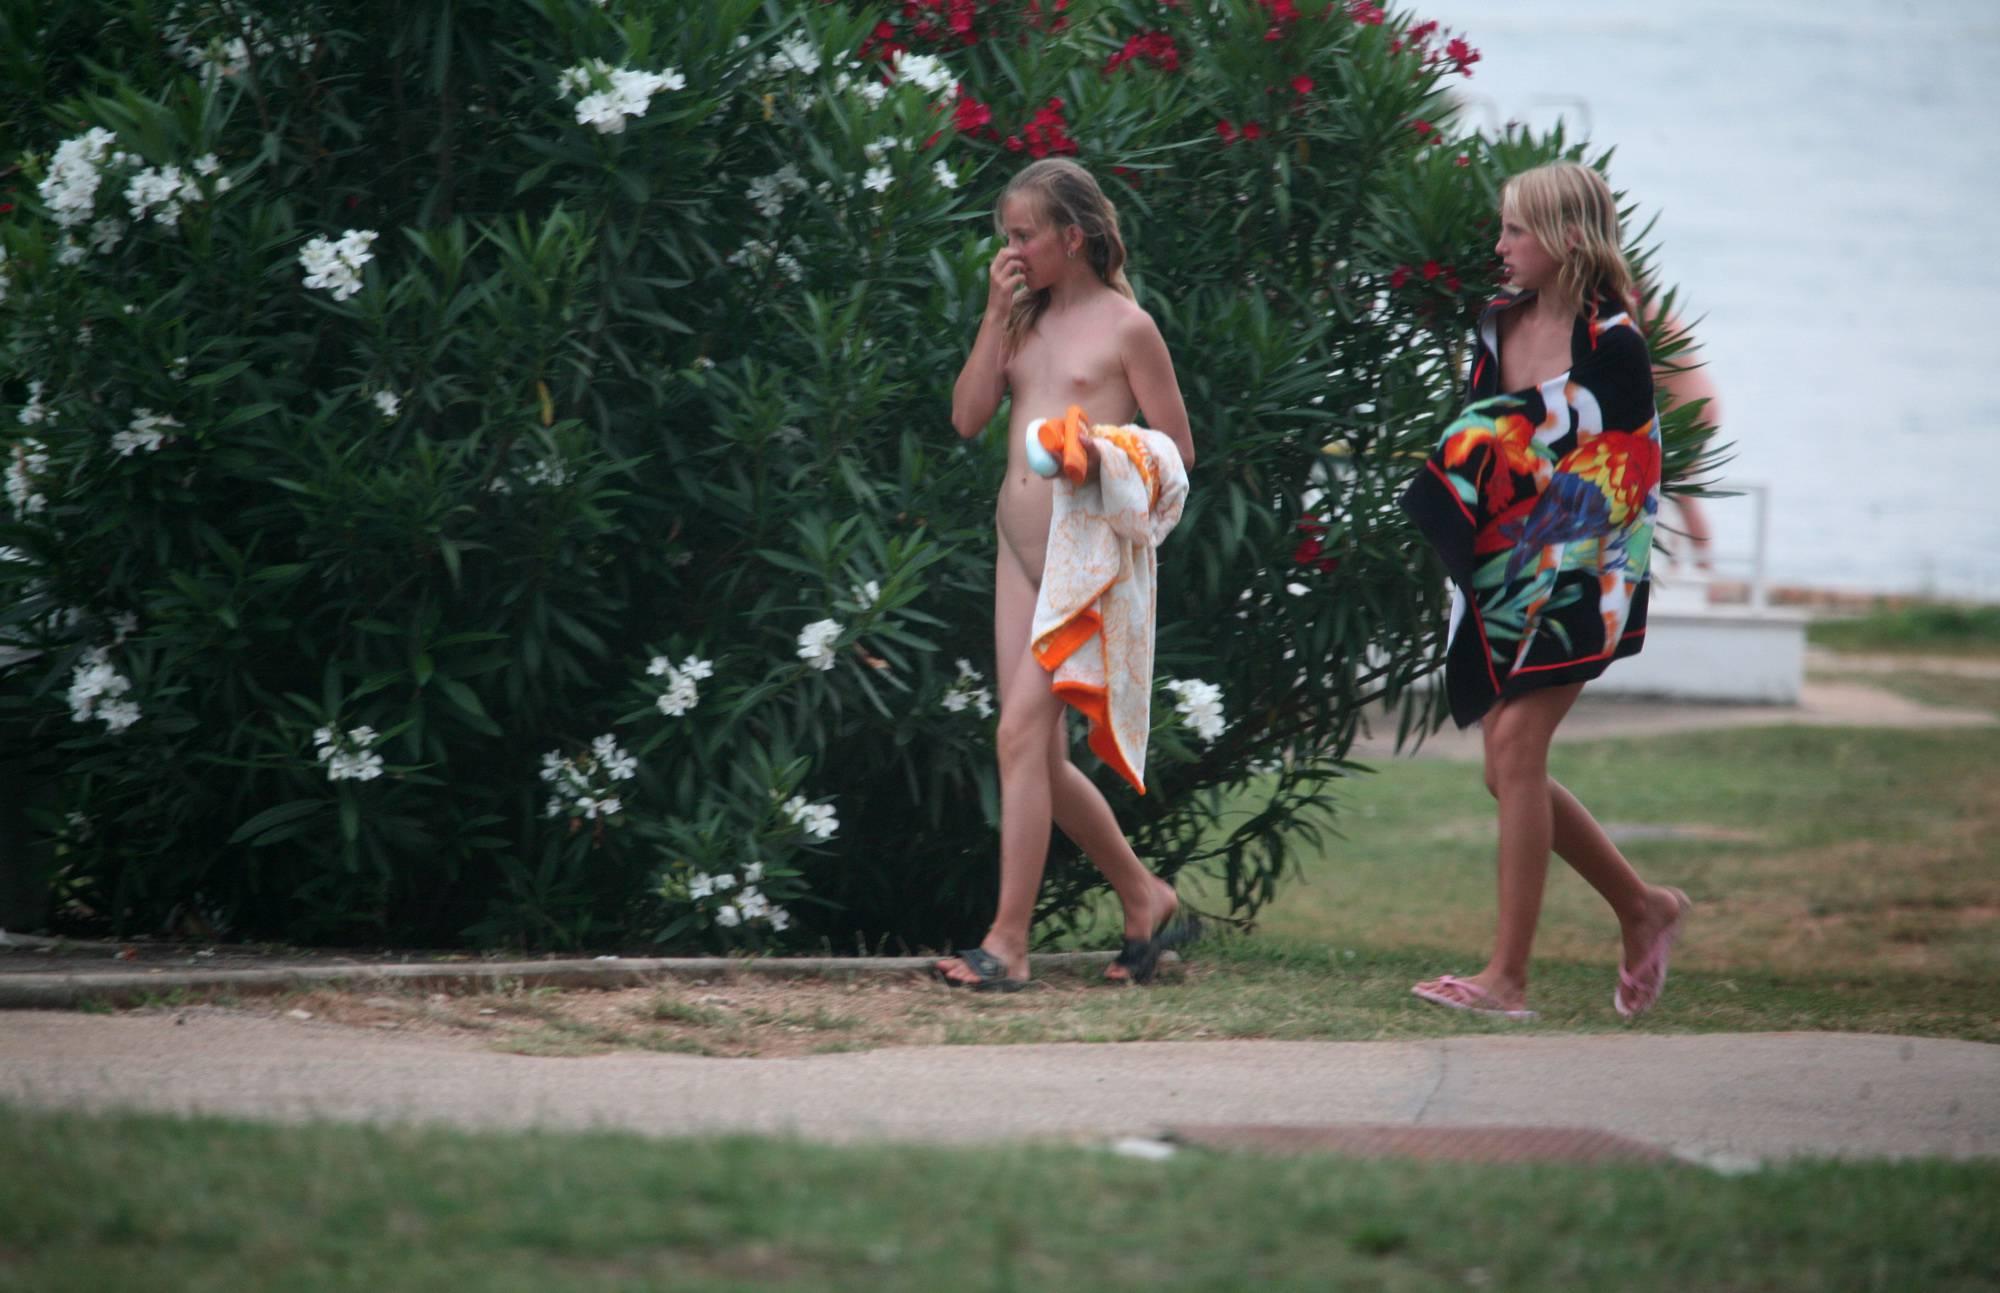 Two Nudist Day Girlfriends - 2